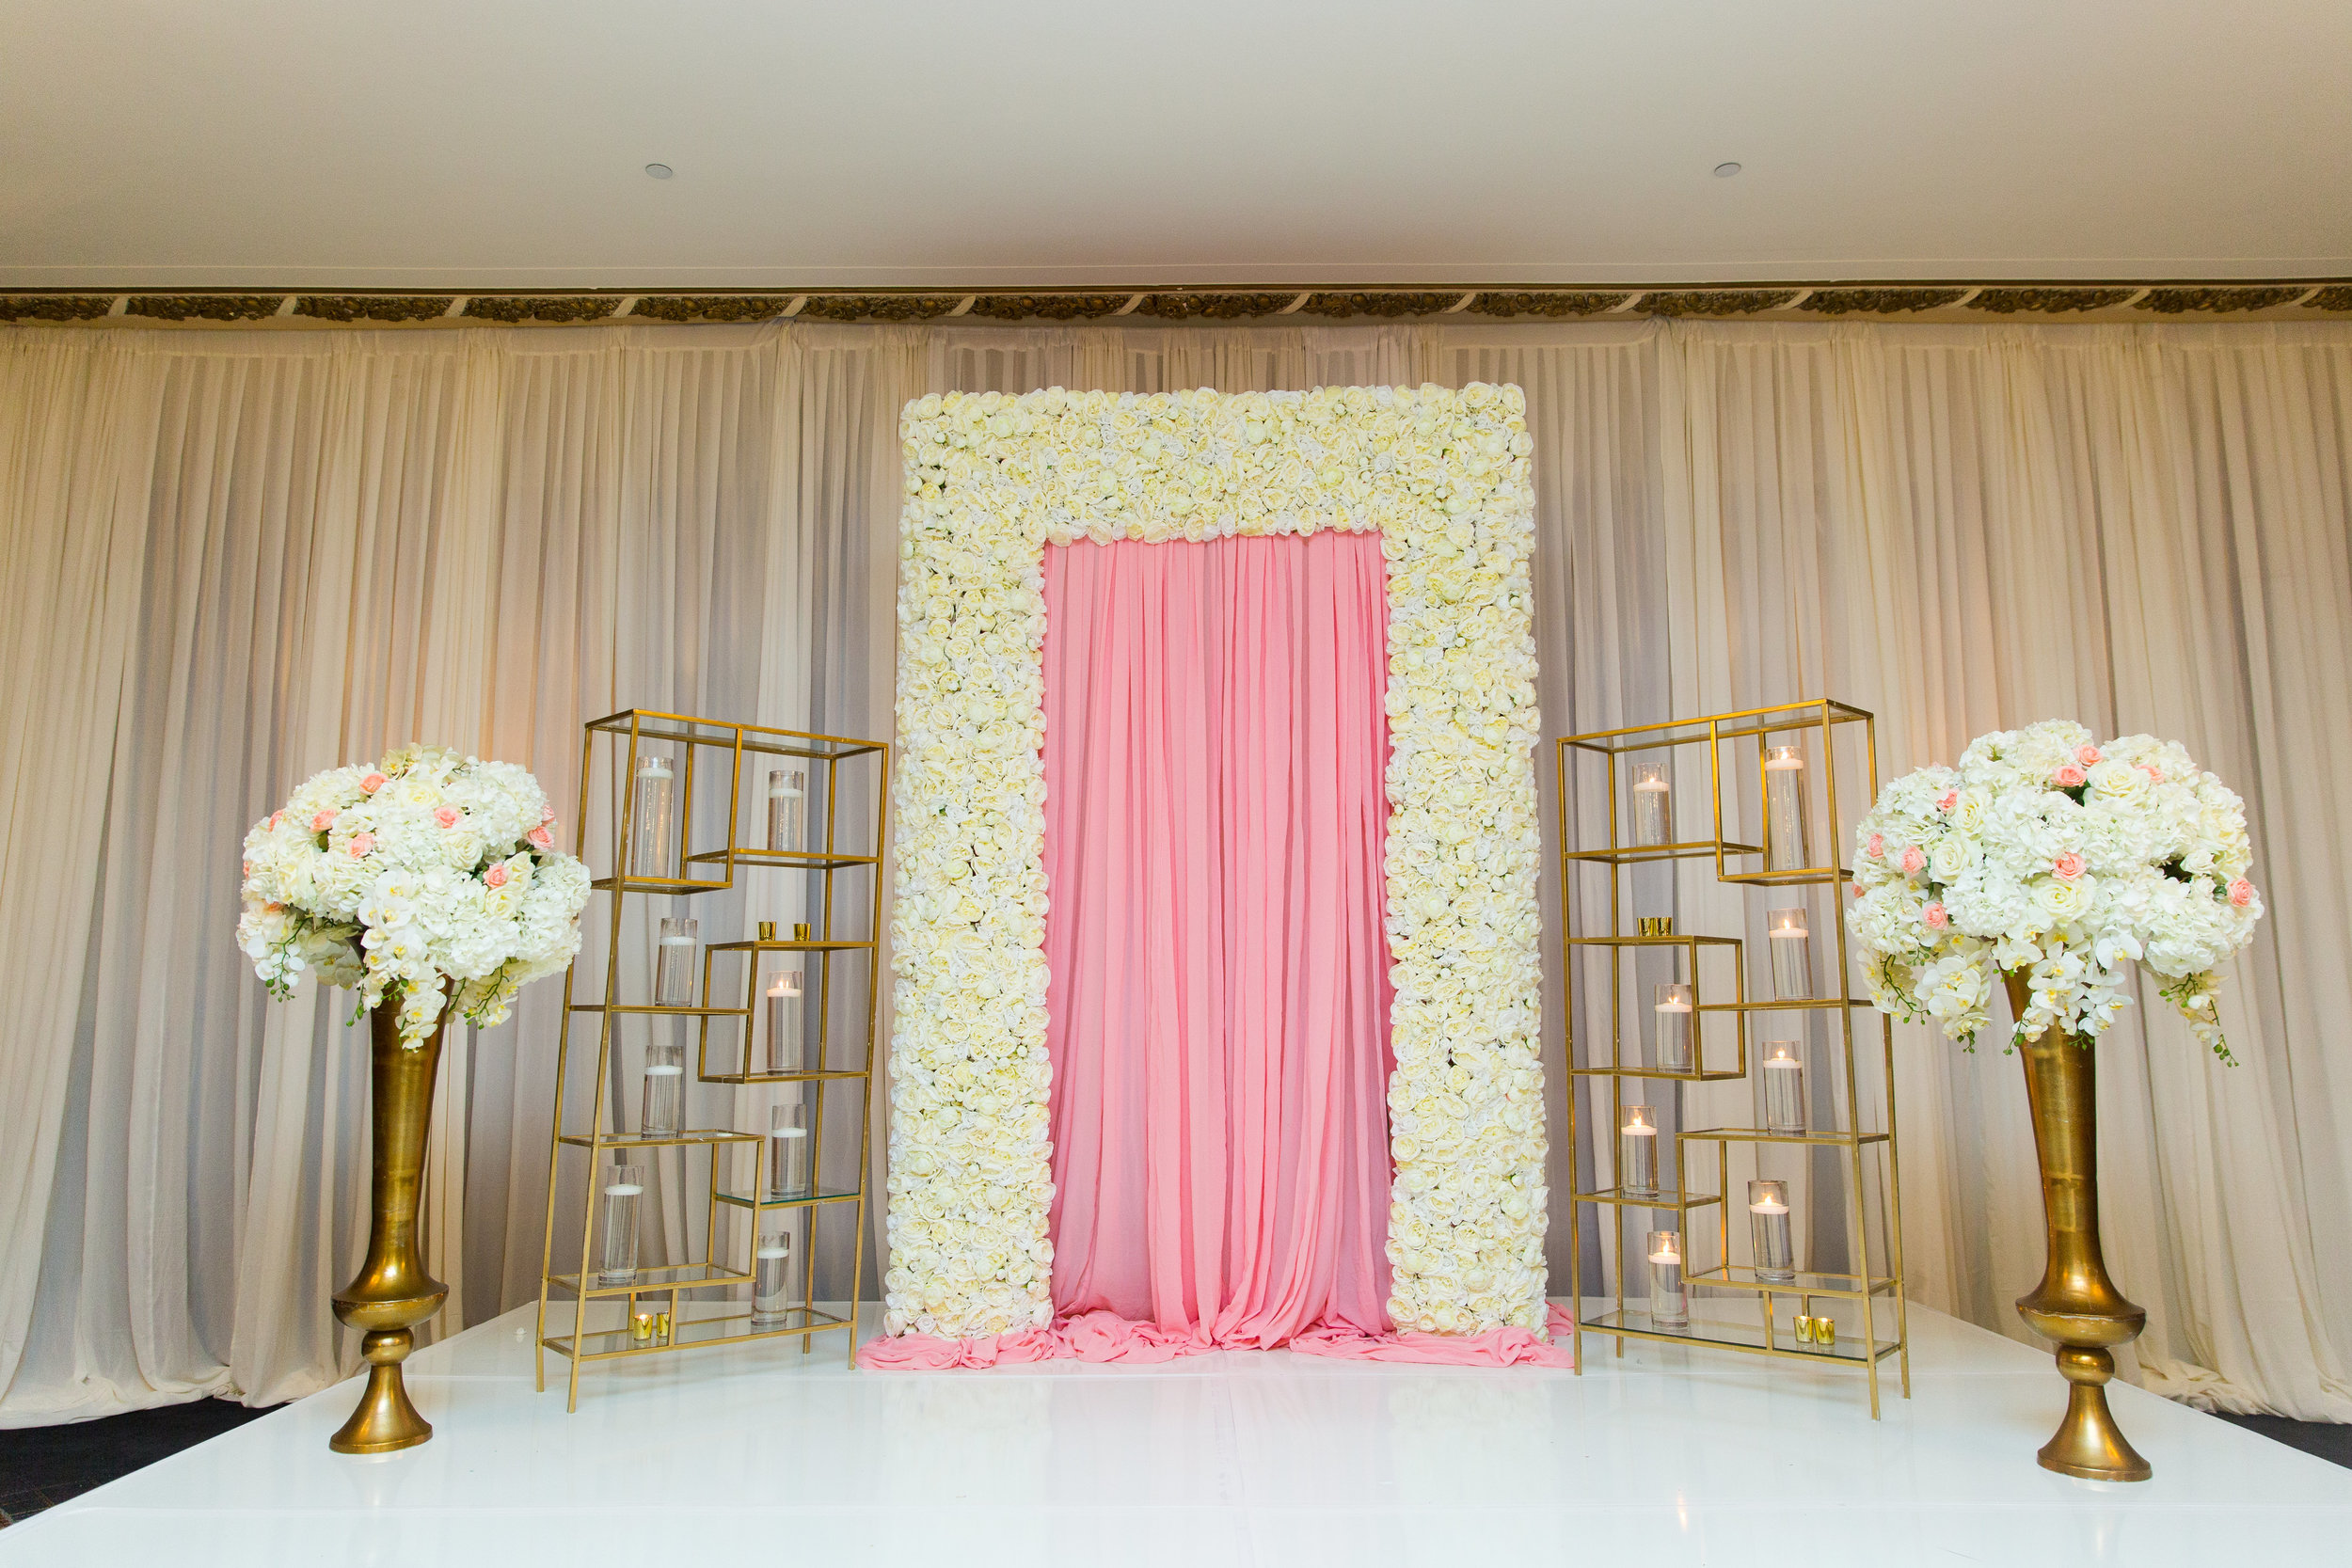 SJ_Wedding_Ceremony -9 - Copy.jpg